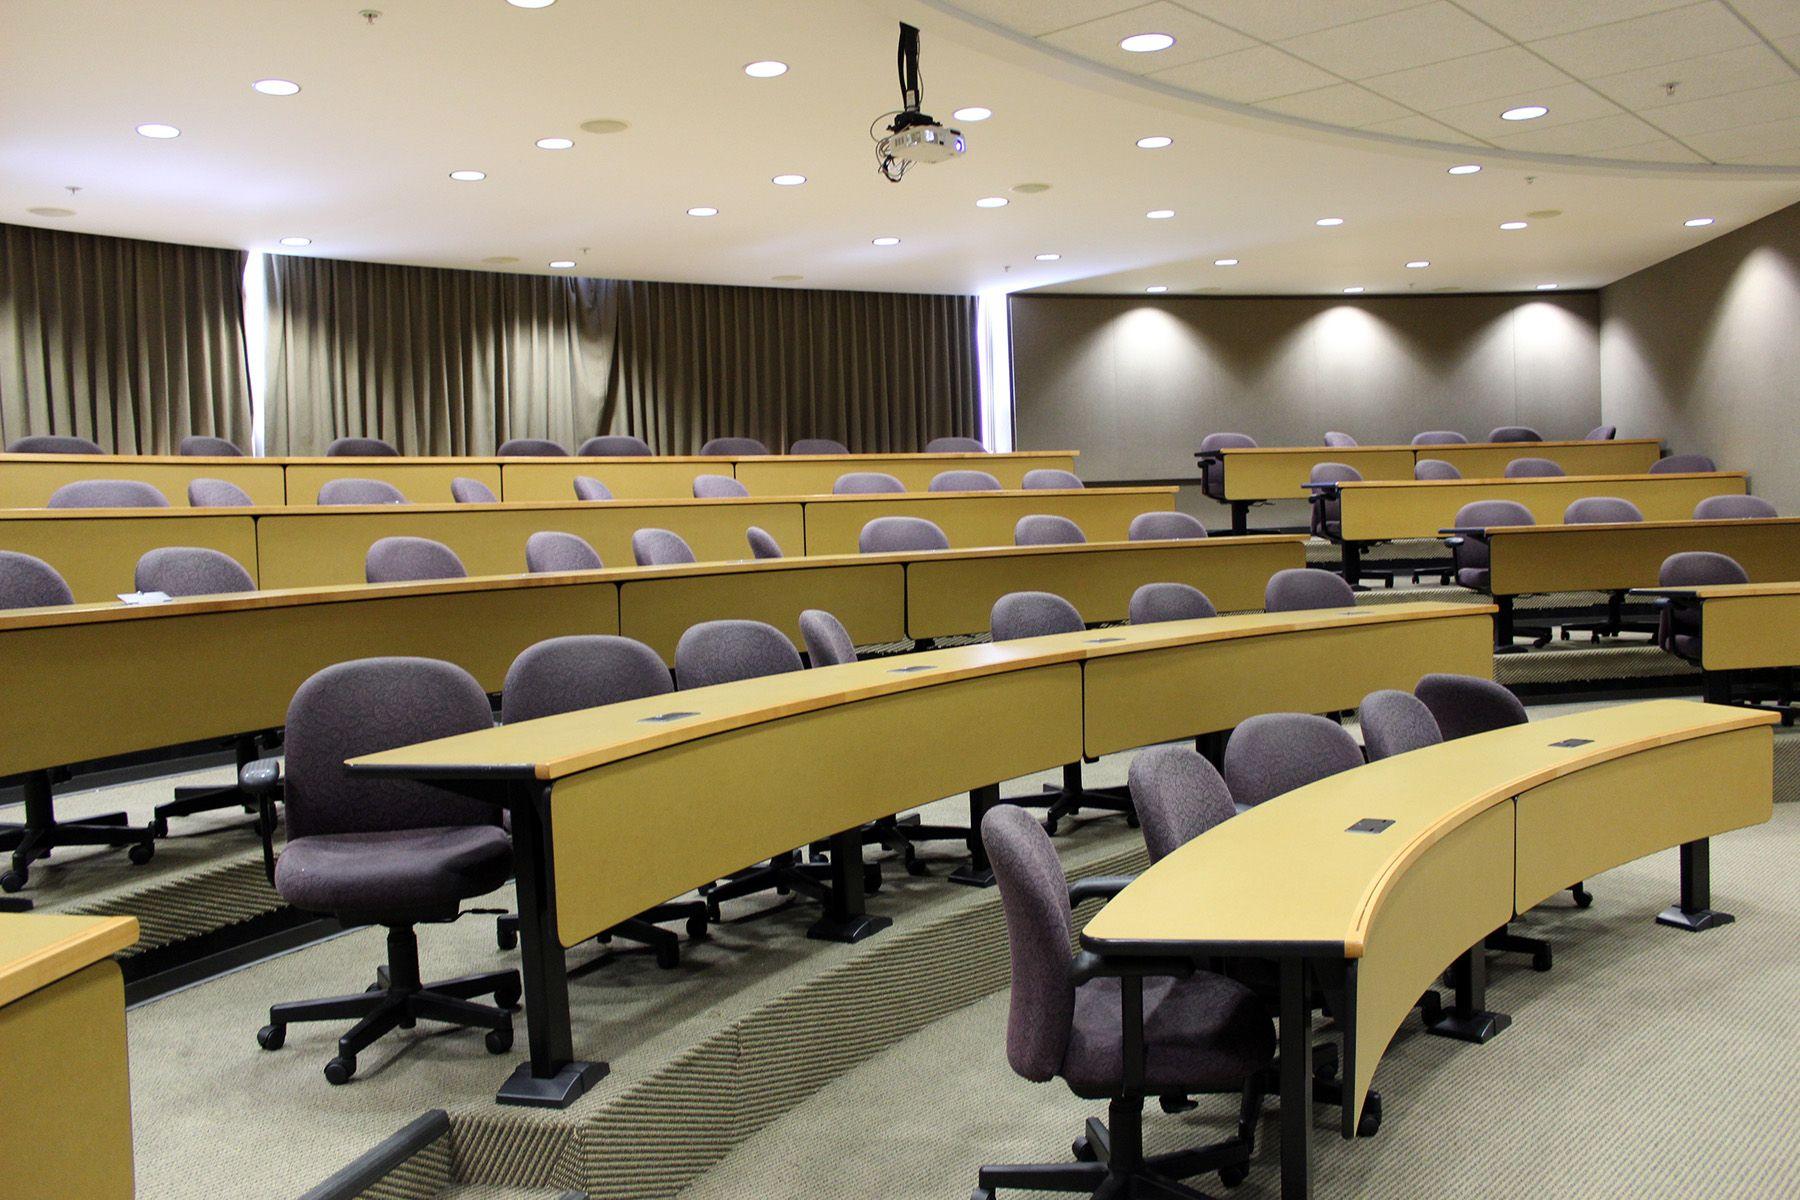 Marian University of Fond du Lac, WI